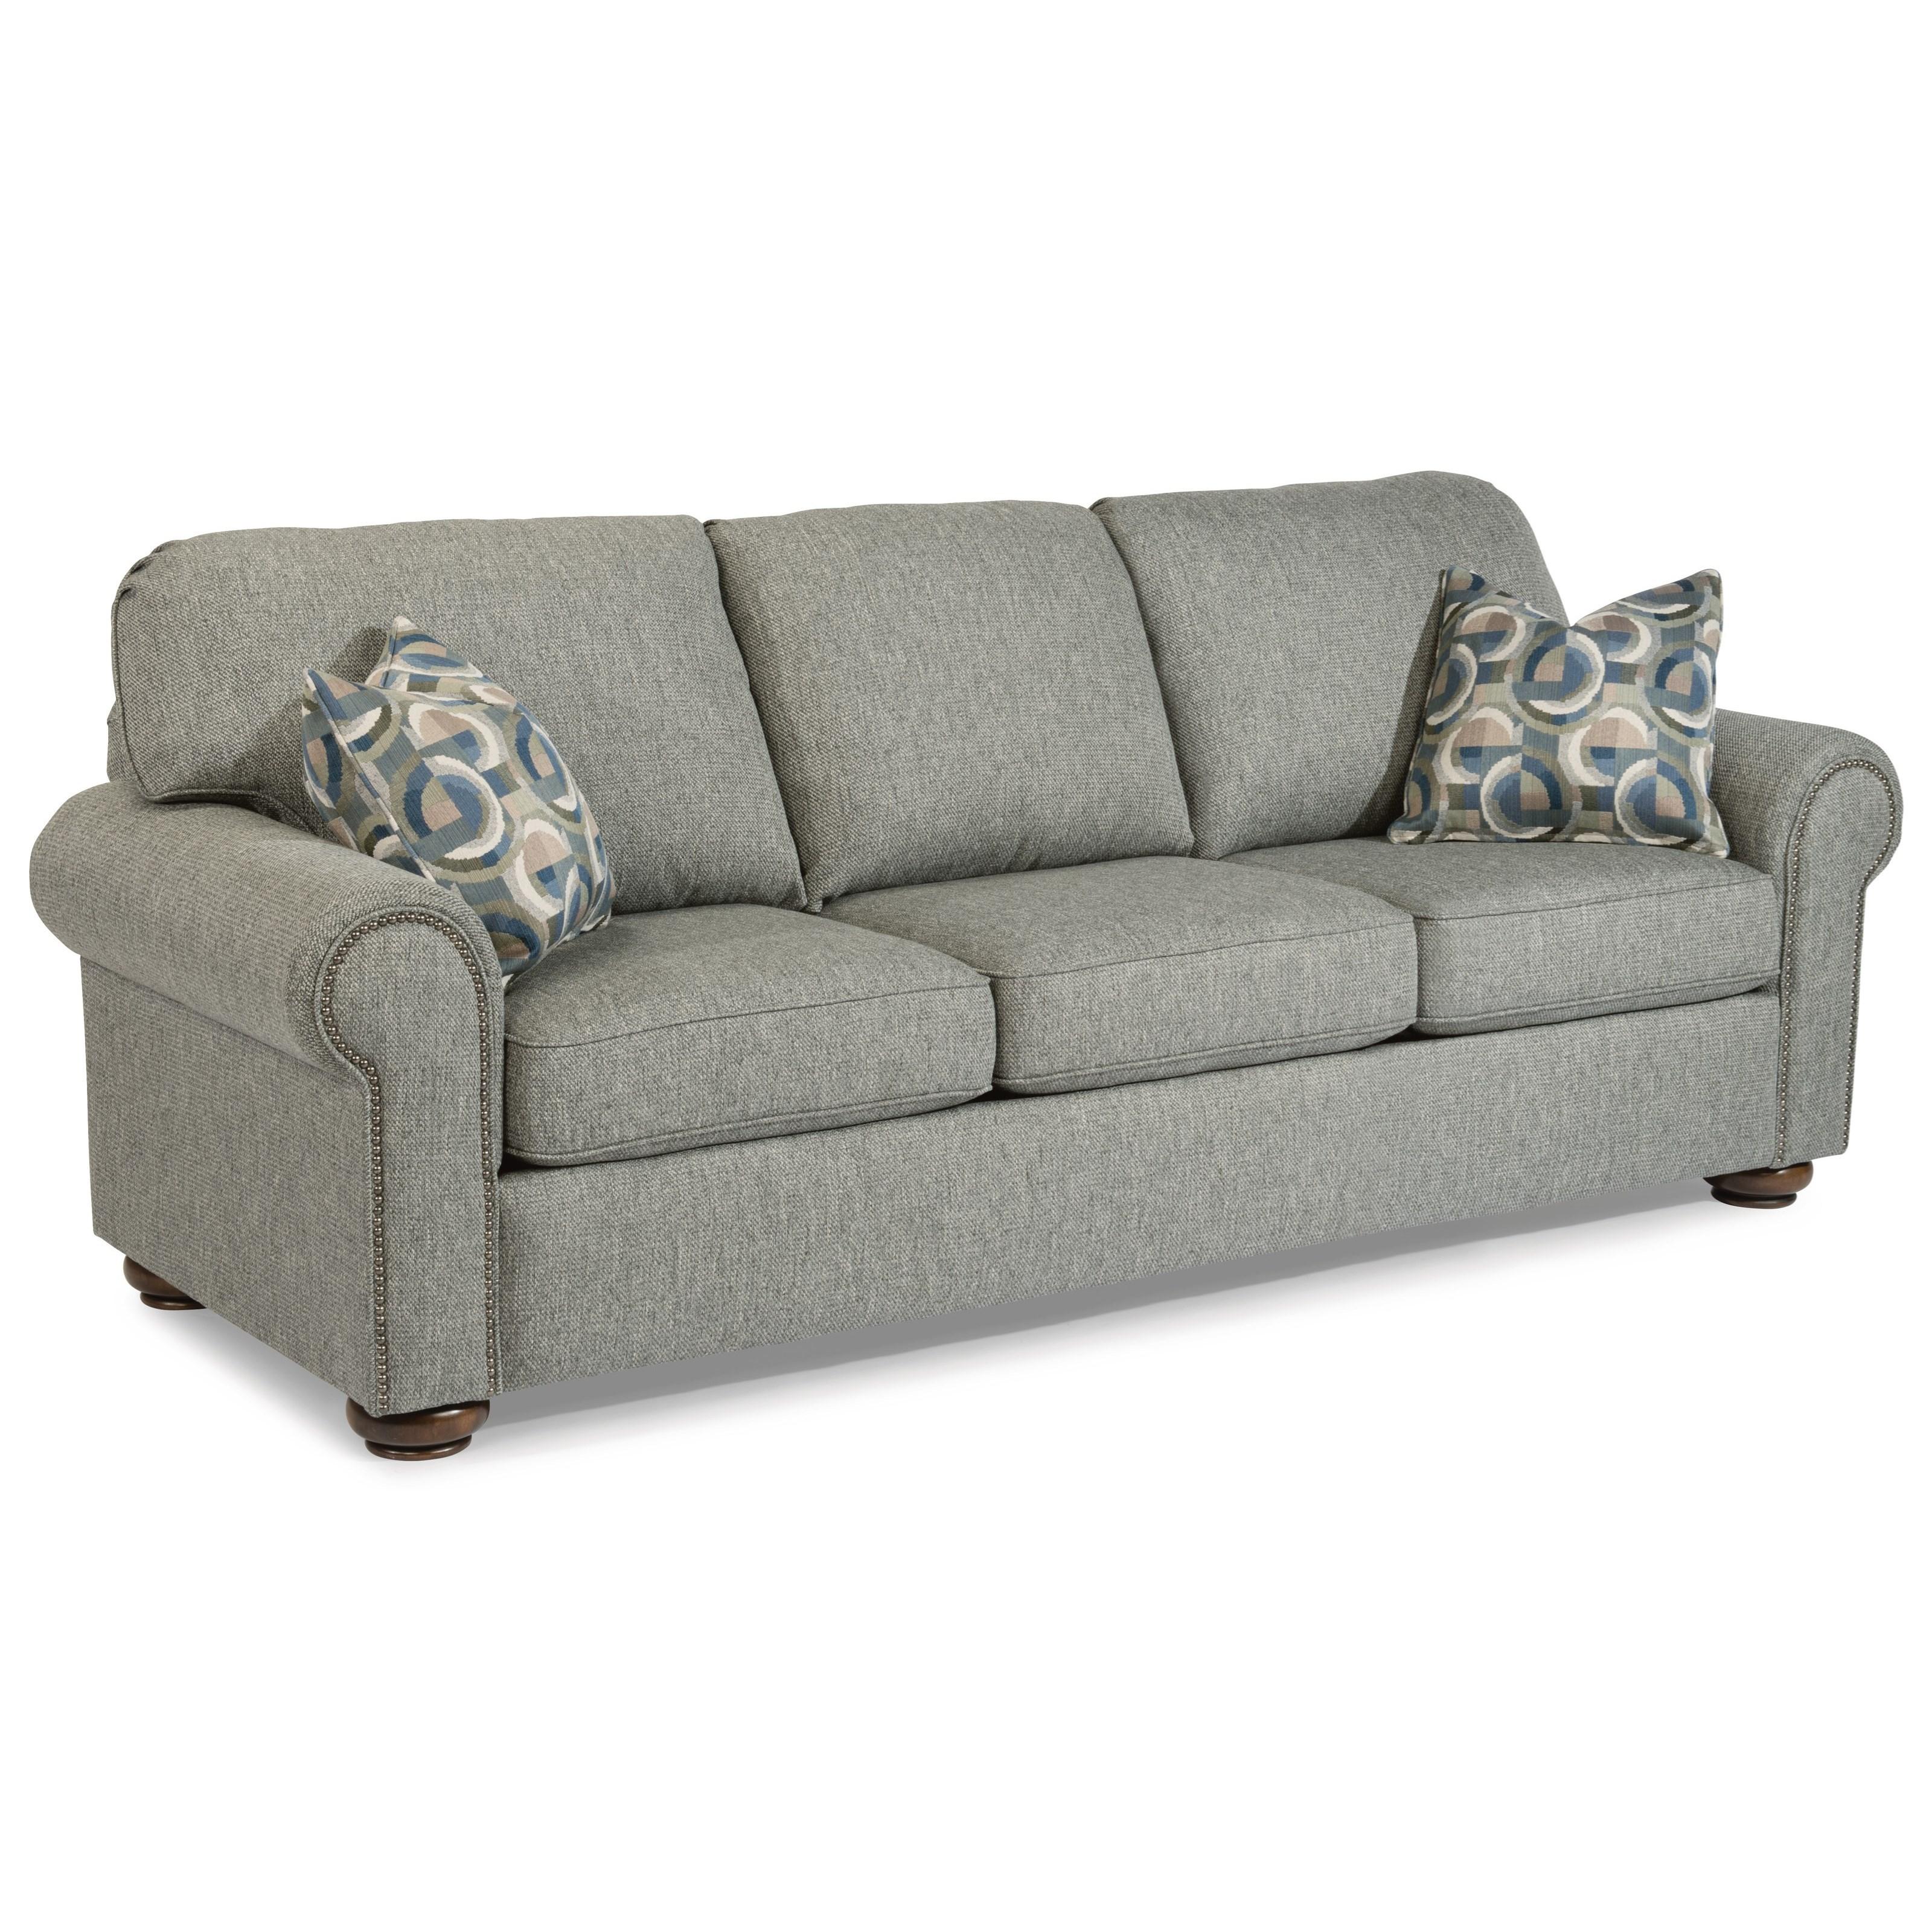 Flexsteel Preston Traditional Queen Sleeper Sofa With Nailhead Trim